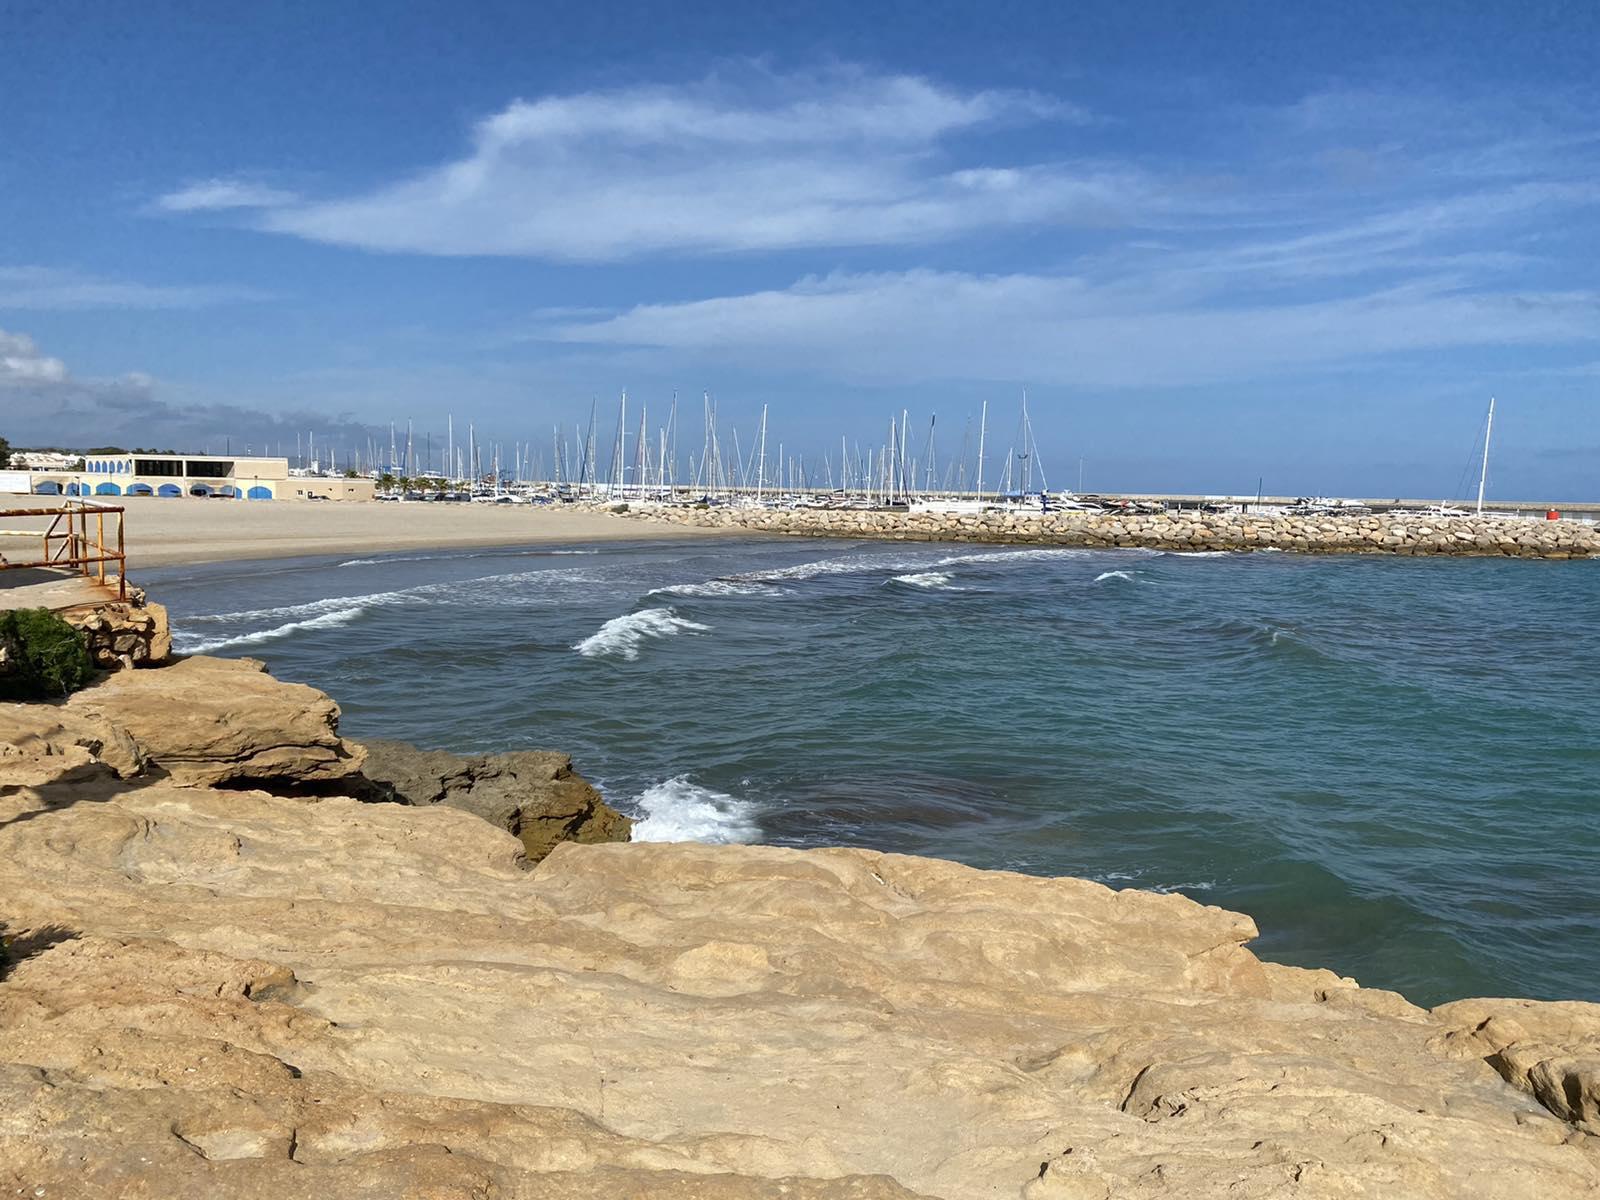 Letovanje Španija Ljoret De Mar More